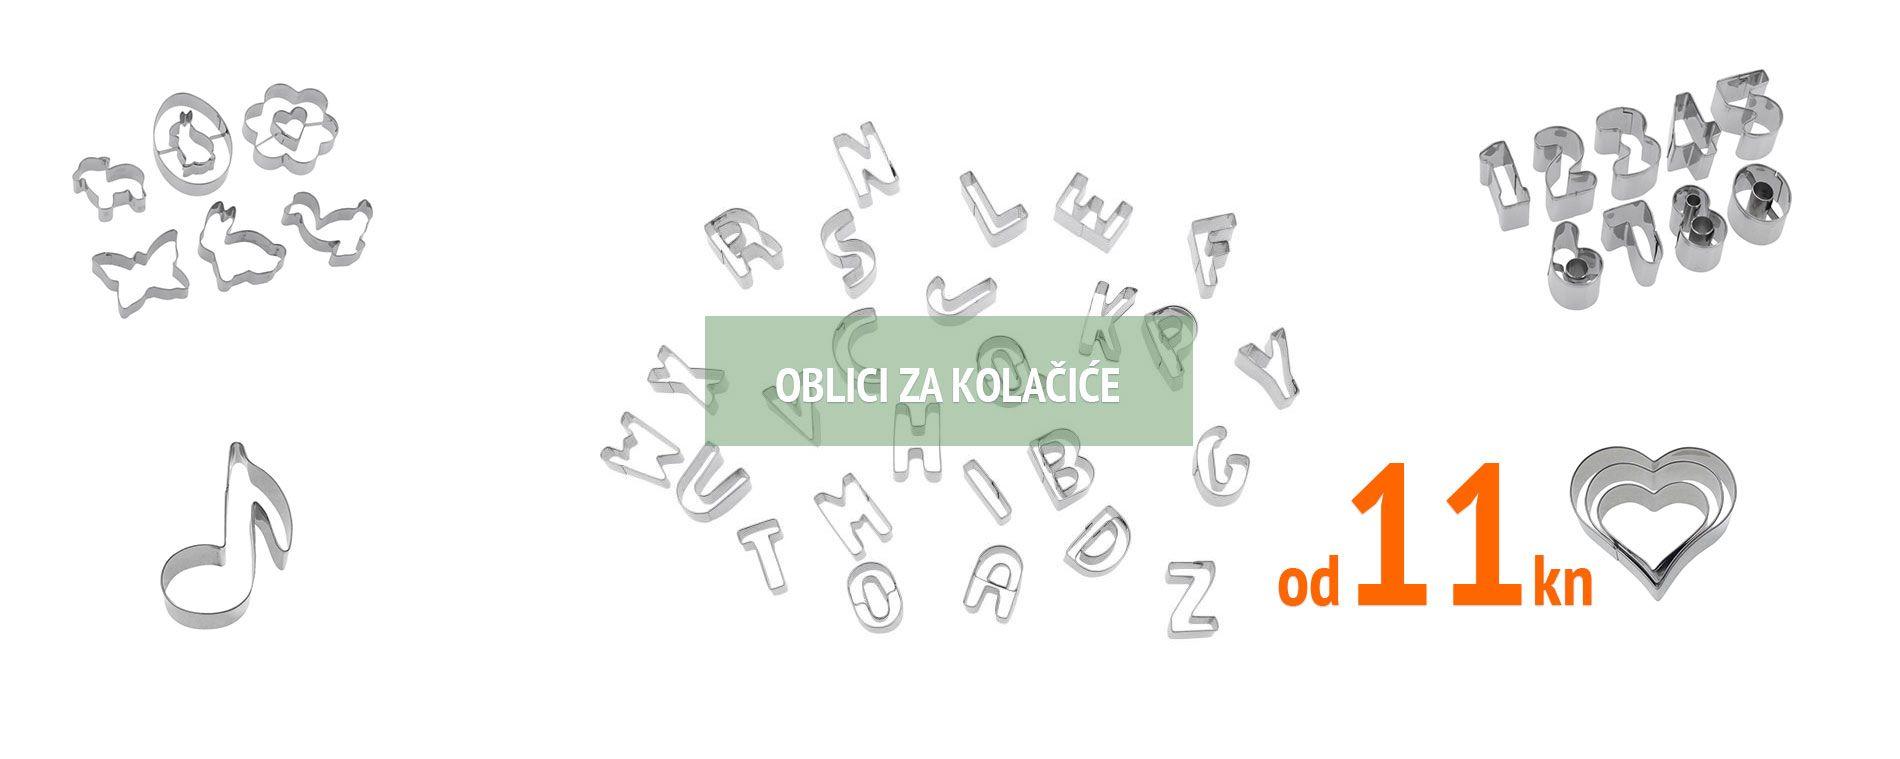 https://www.kuhinja.net/kuhati/kolaci/oblici-za-kolacice#product_list_order=price